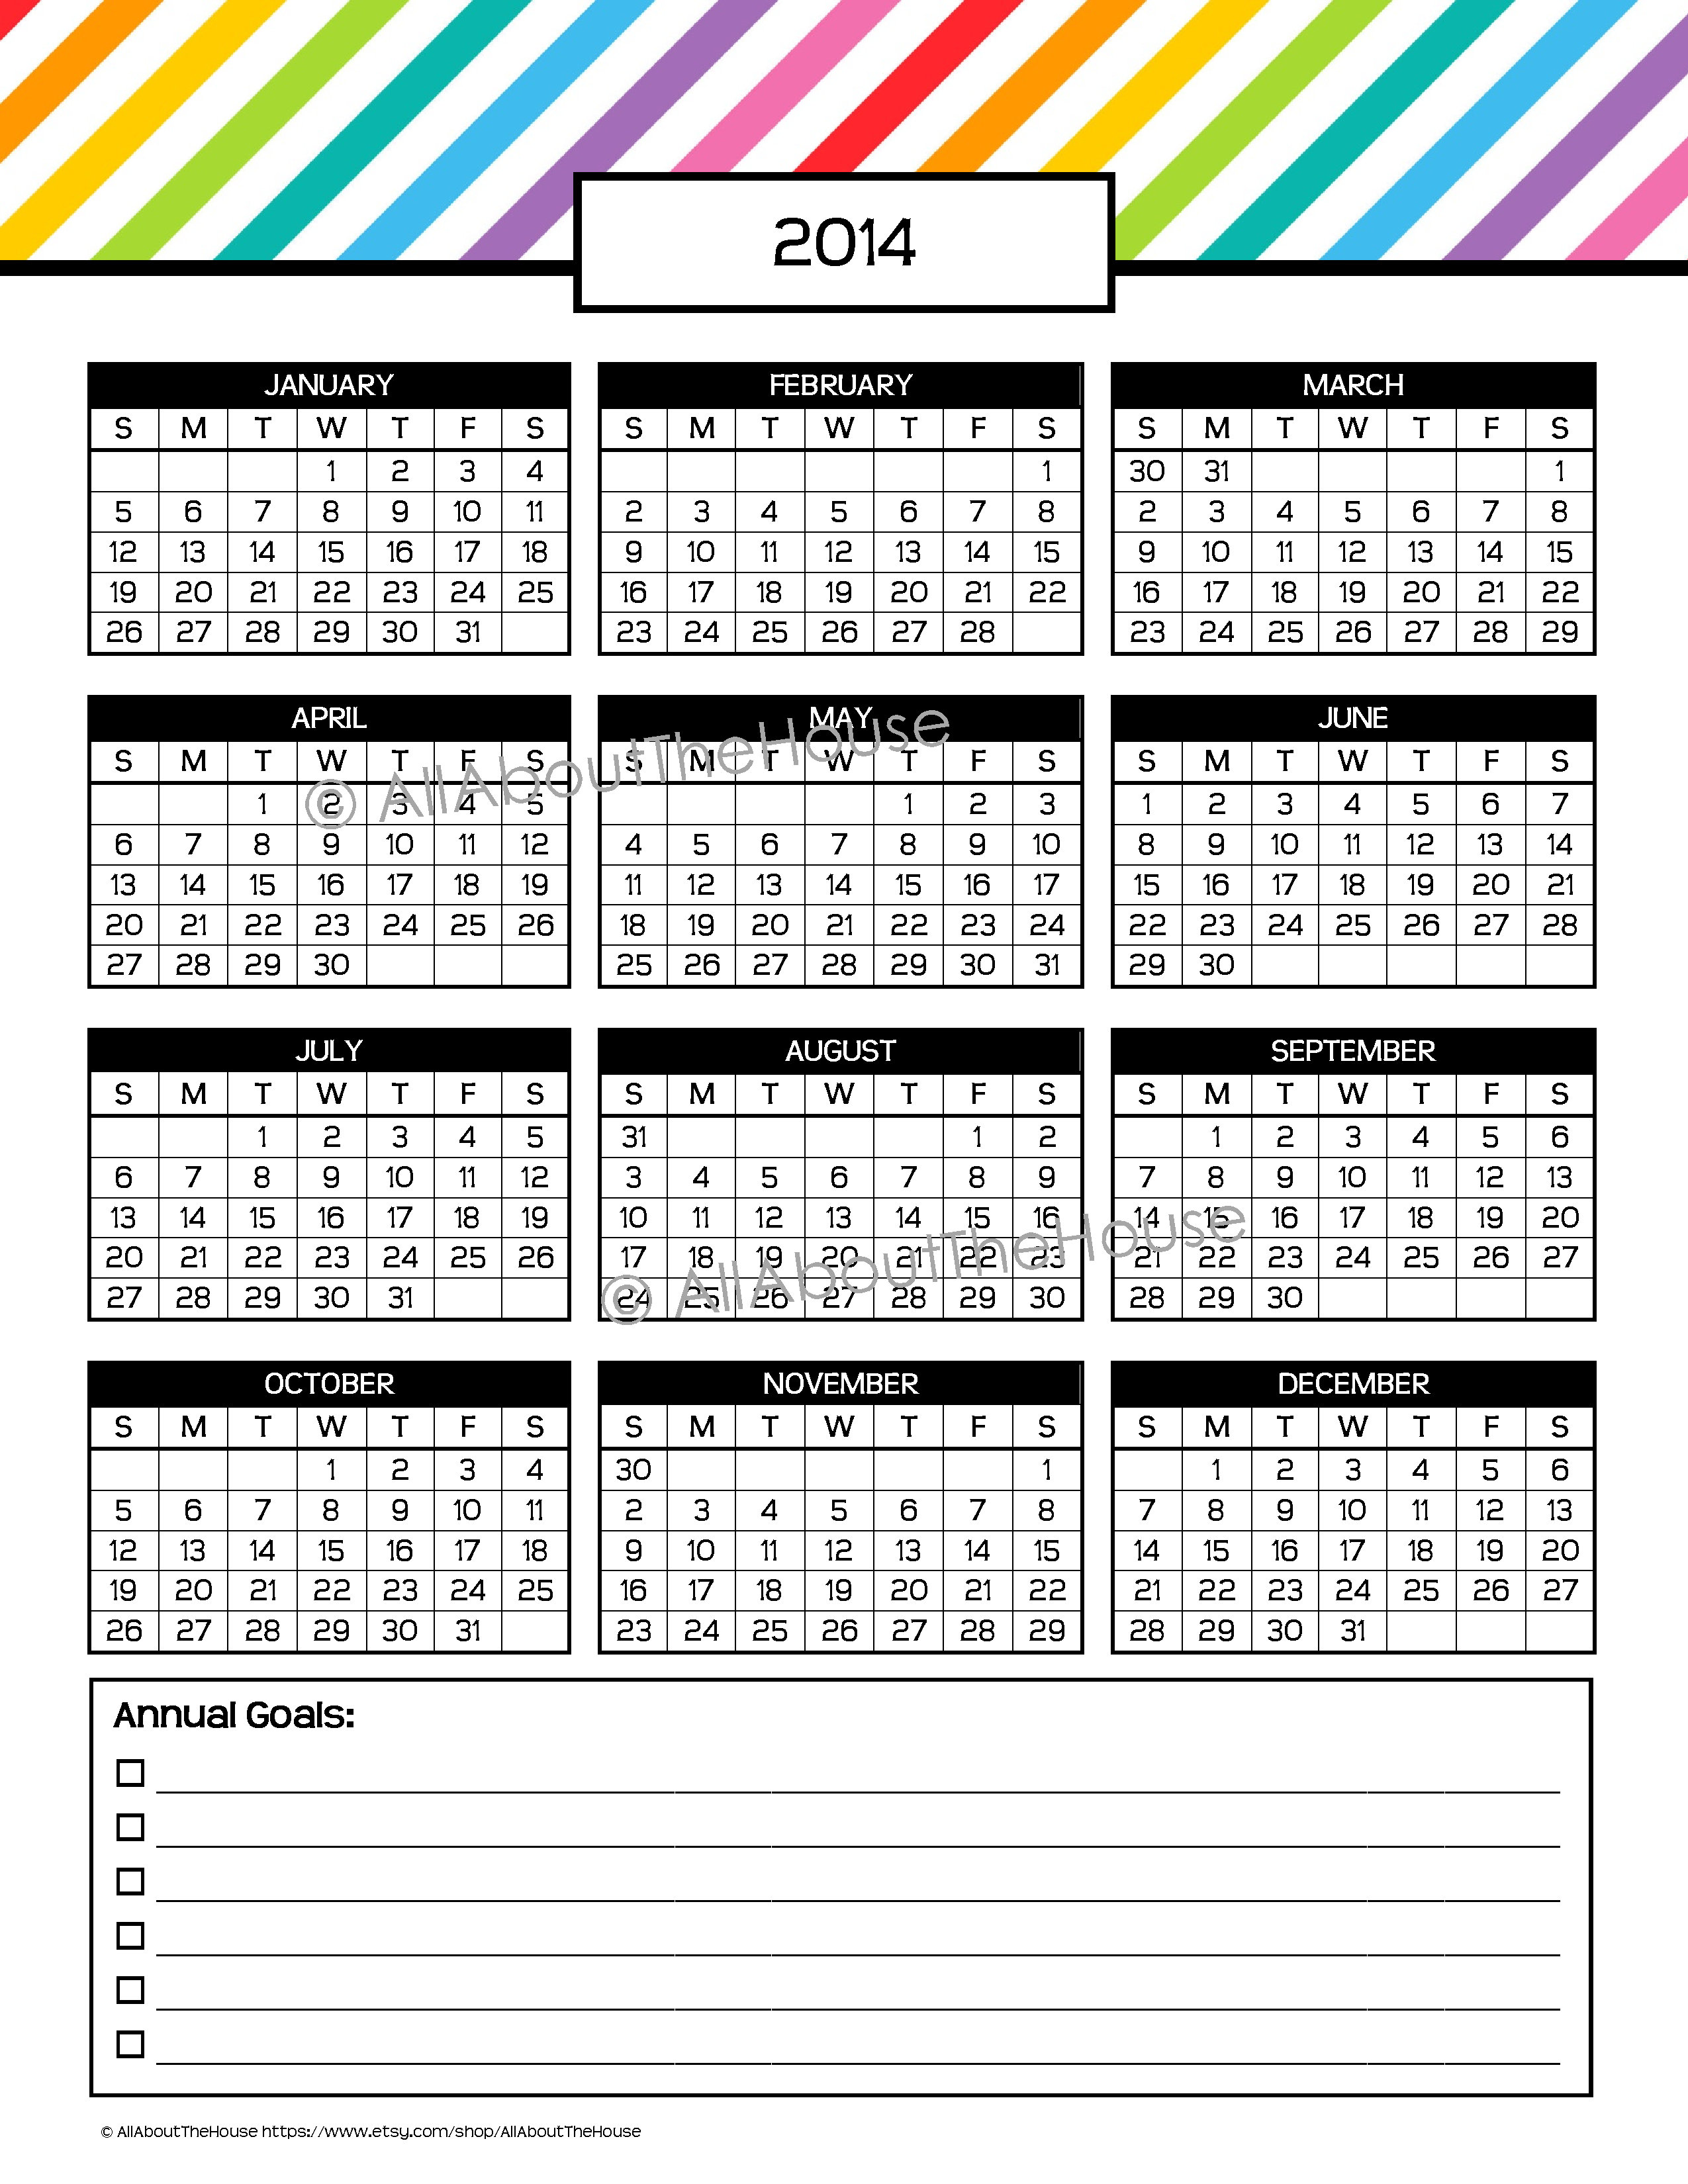 2015 calendar printable one page with holidays militaryalicious my 2015 printable rainbow daily planner allaboutthehouse printables saigontimesfo